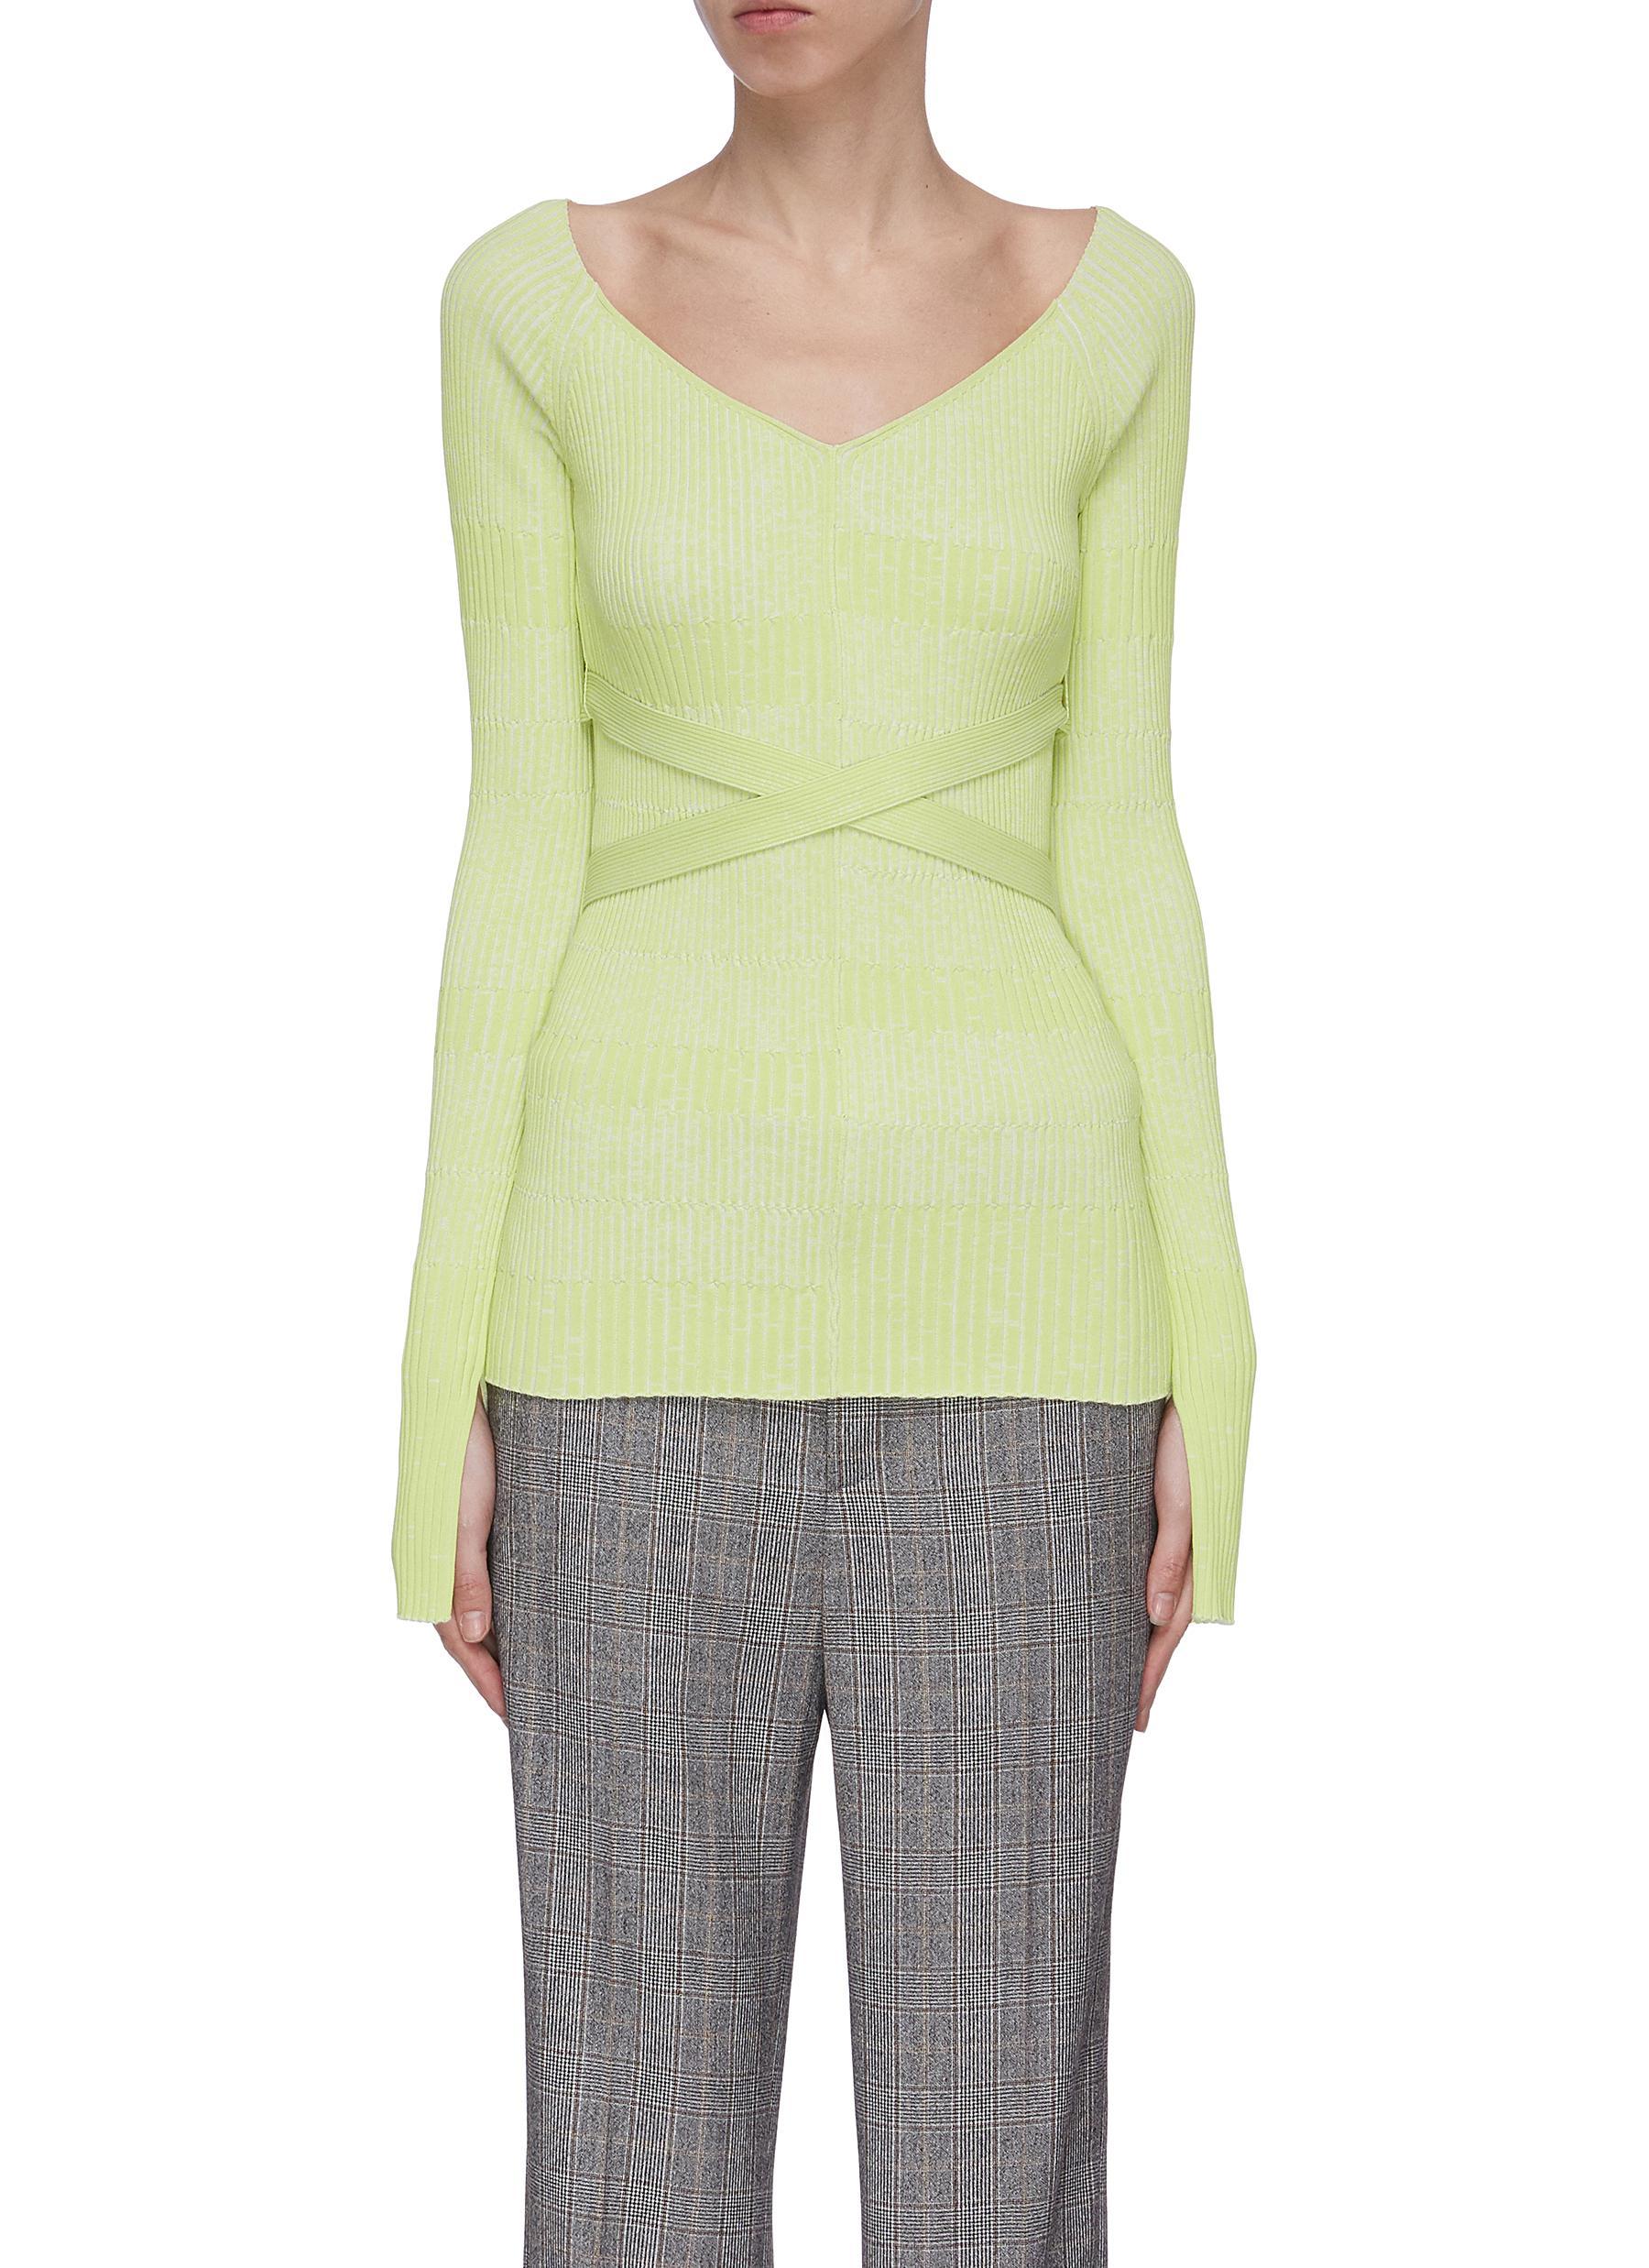 Buy Mrz Knitwear 'Scollo' wrapped V-neck sweater